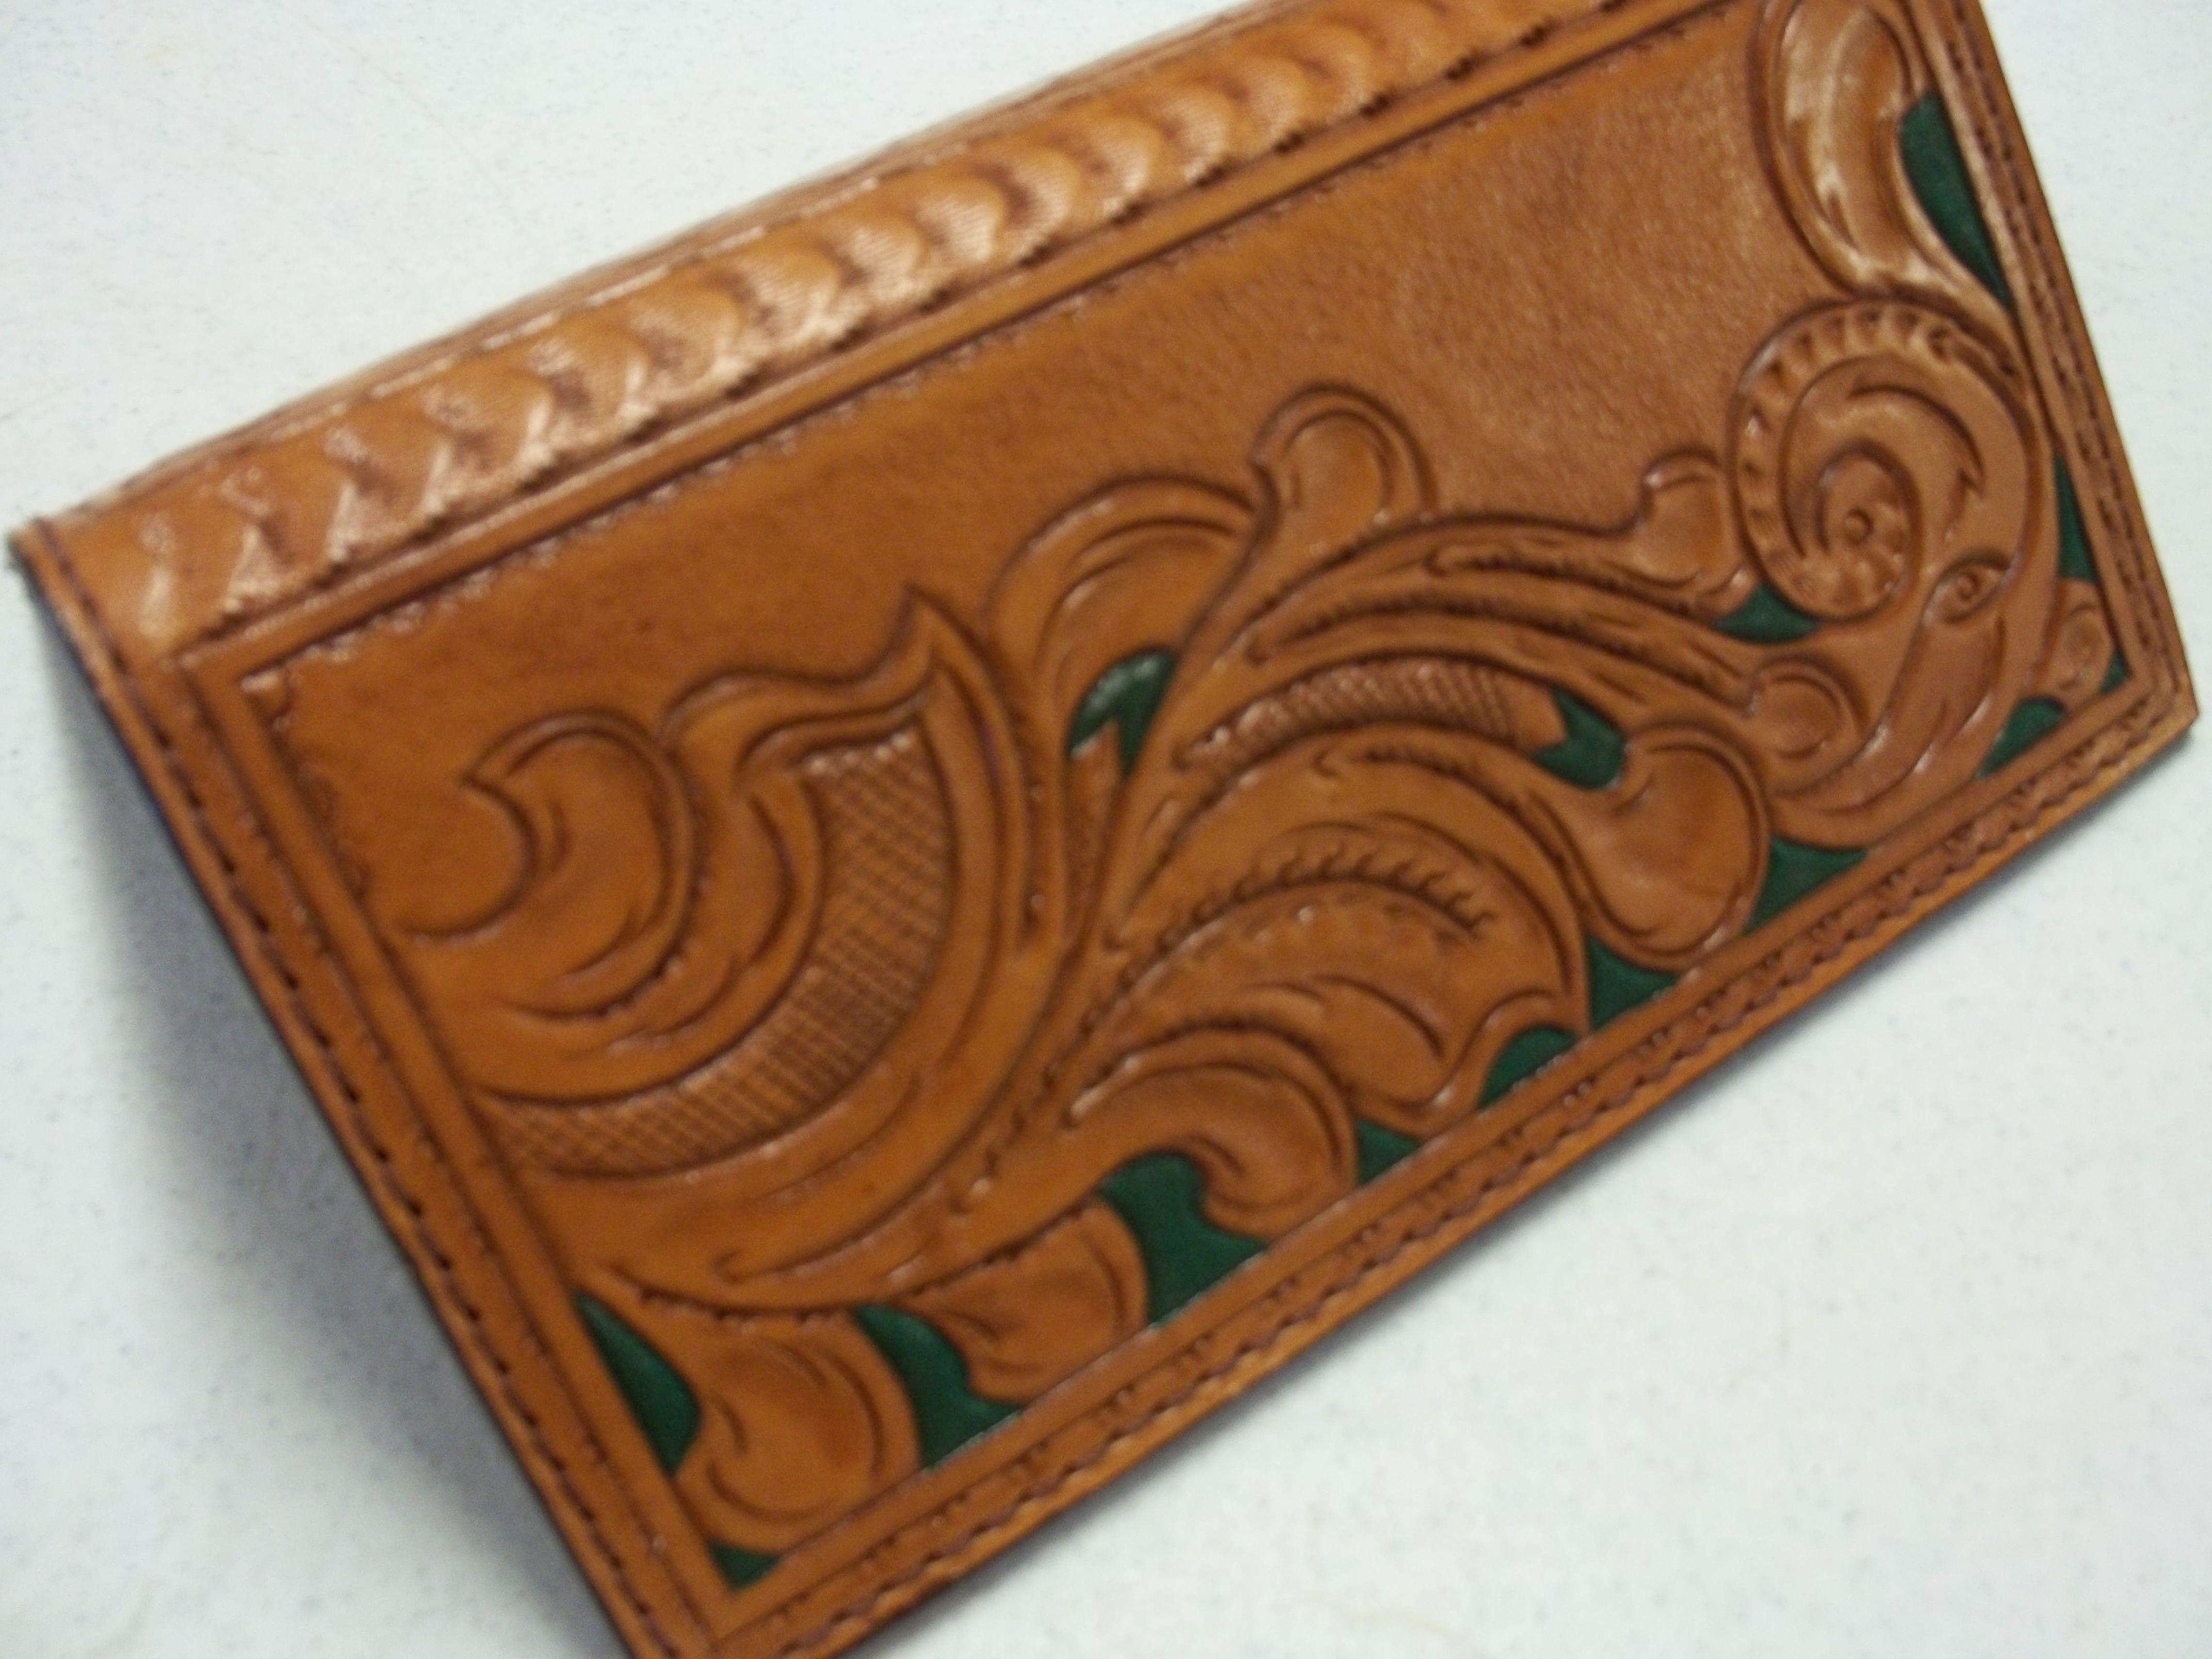 a0bf293c2b07b Handmade Roper Style Leather Bi-Fold Wallets by Bluehorn Custom ...